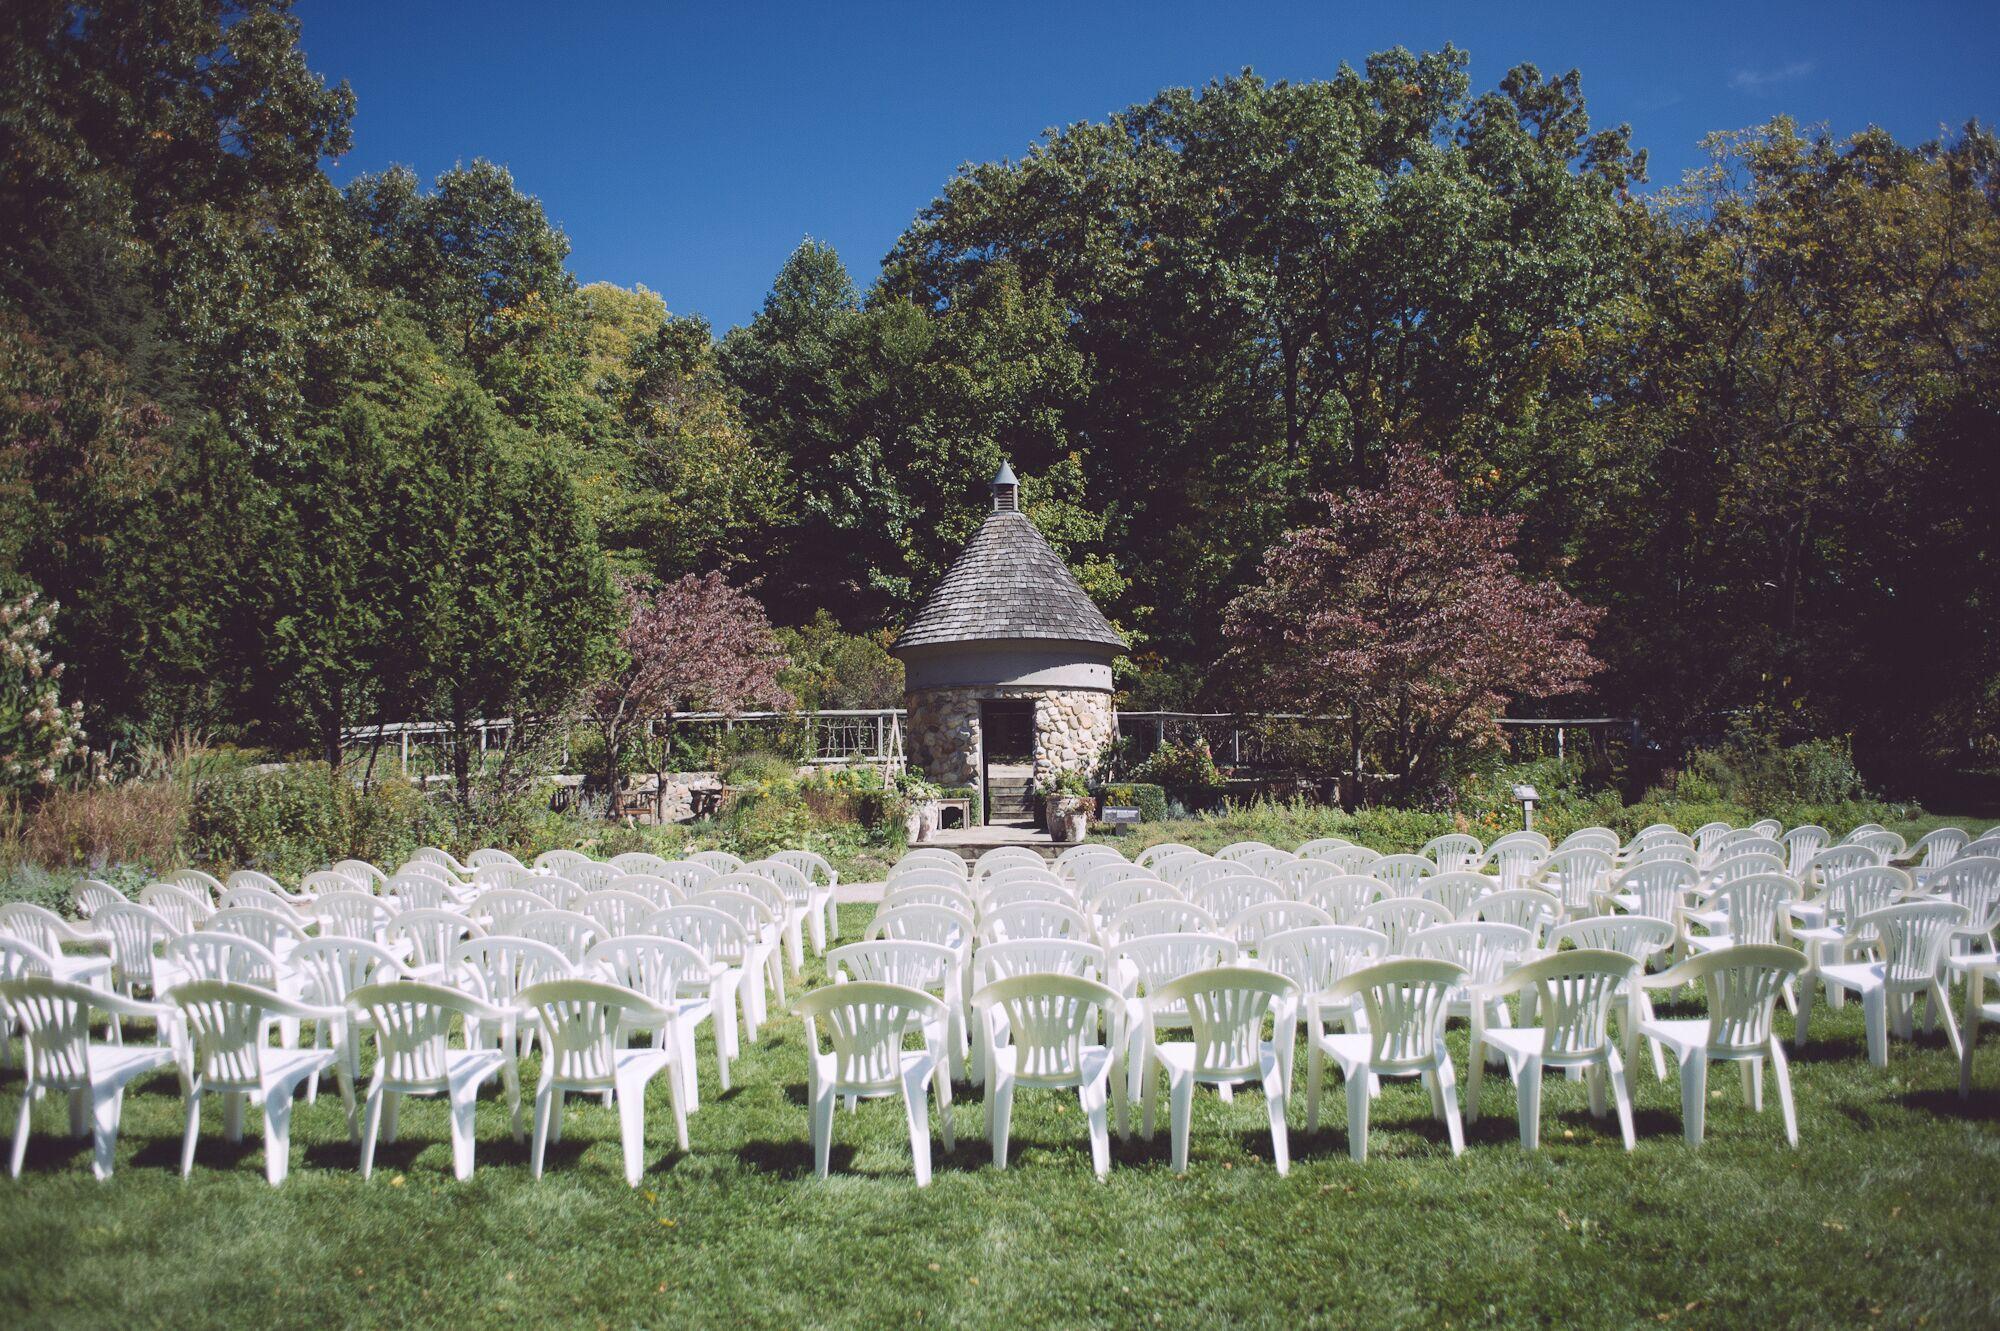 Wedding ceremony chair - Fernwood Botanical Gardens Wedding Ceremony